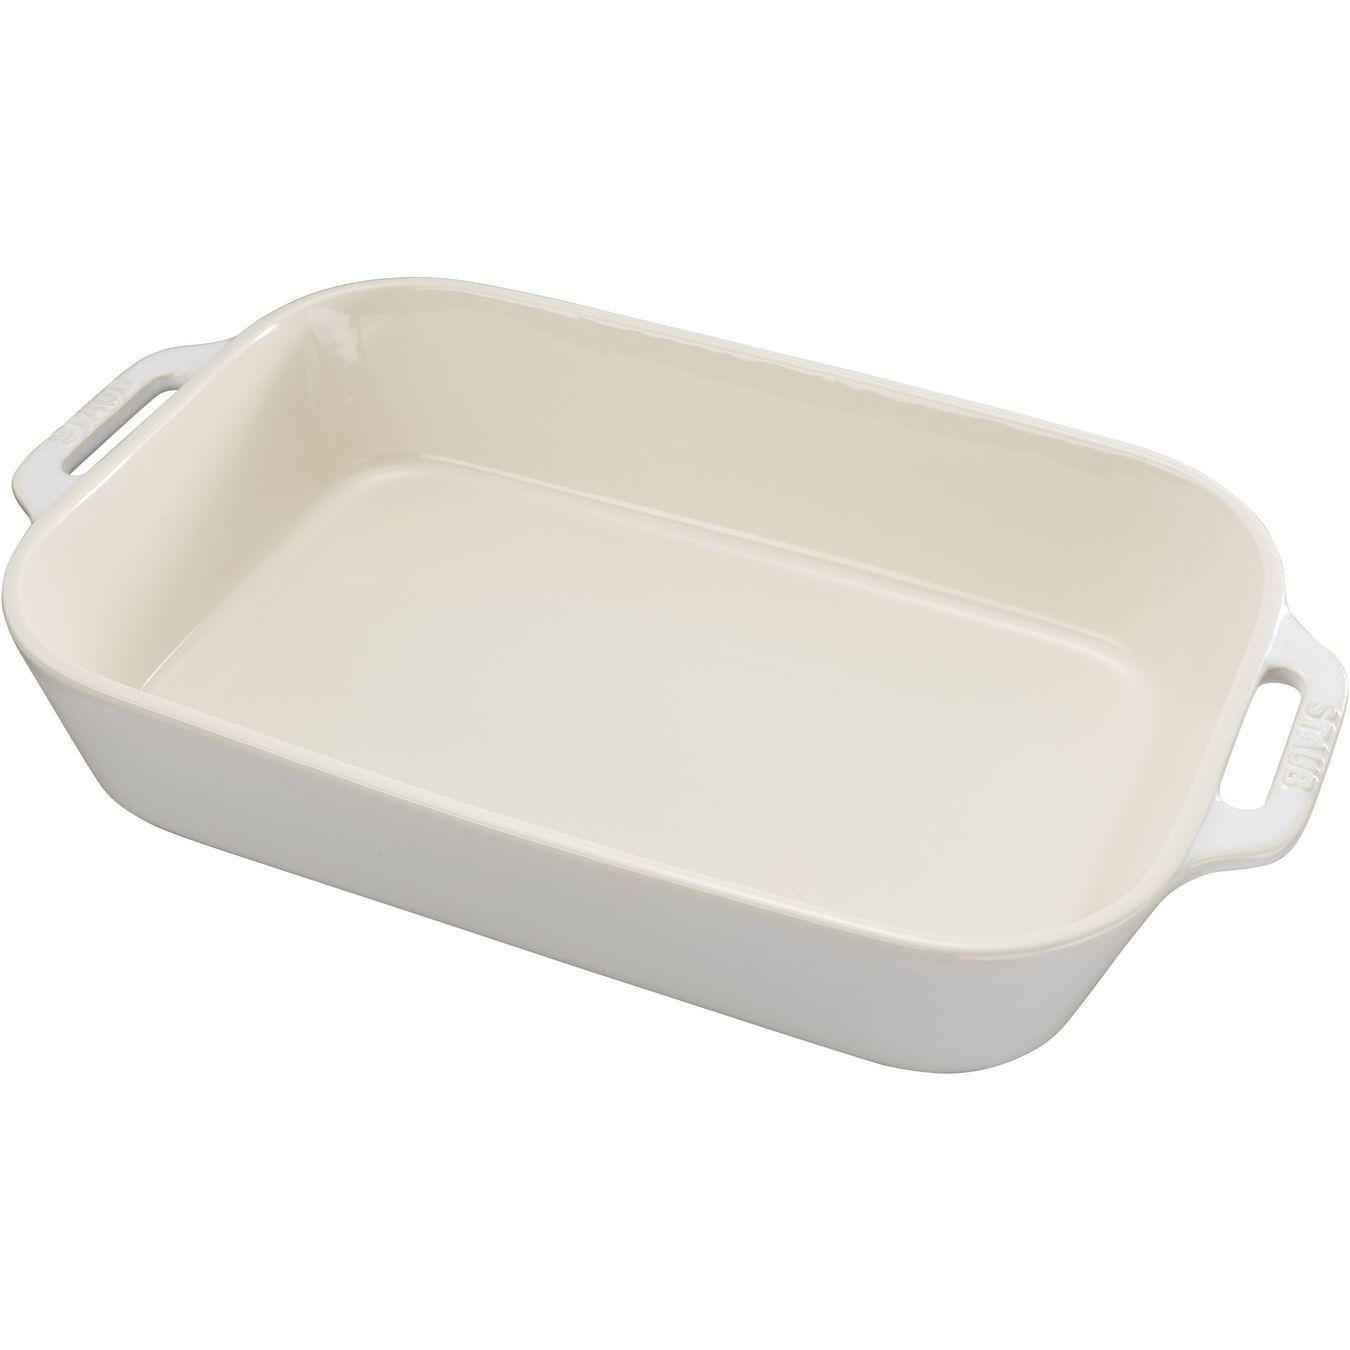 Ceramic rectangular Oven dish, Ivory-White,,large 1